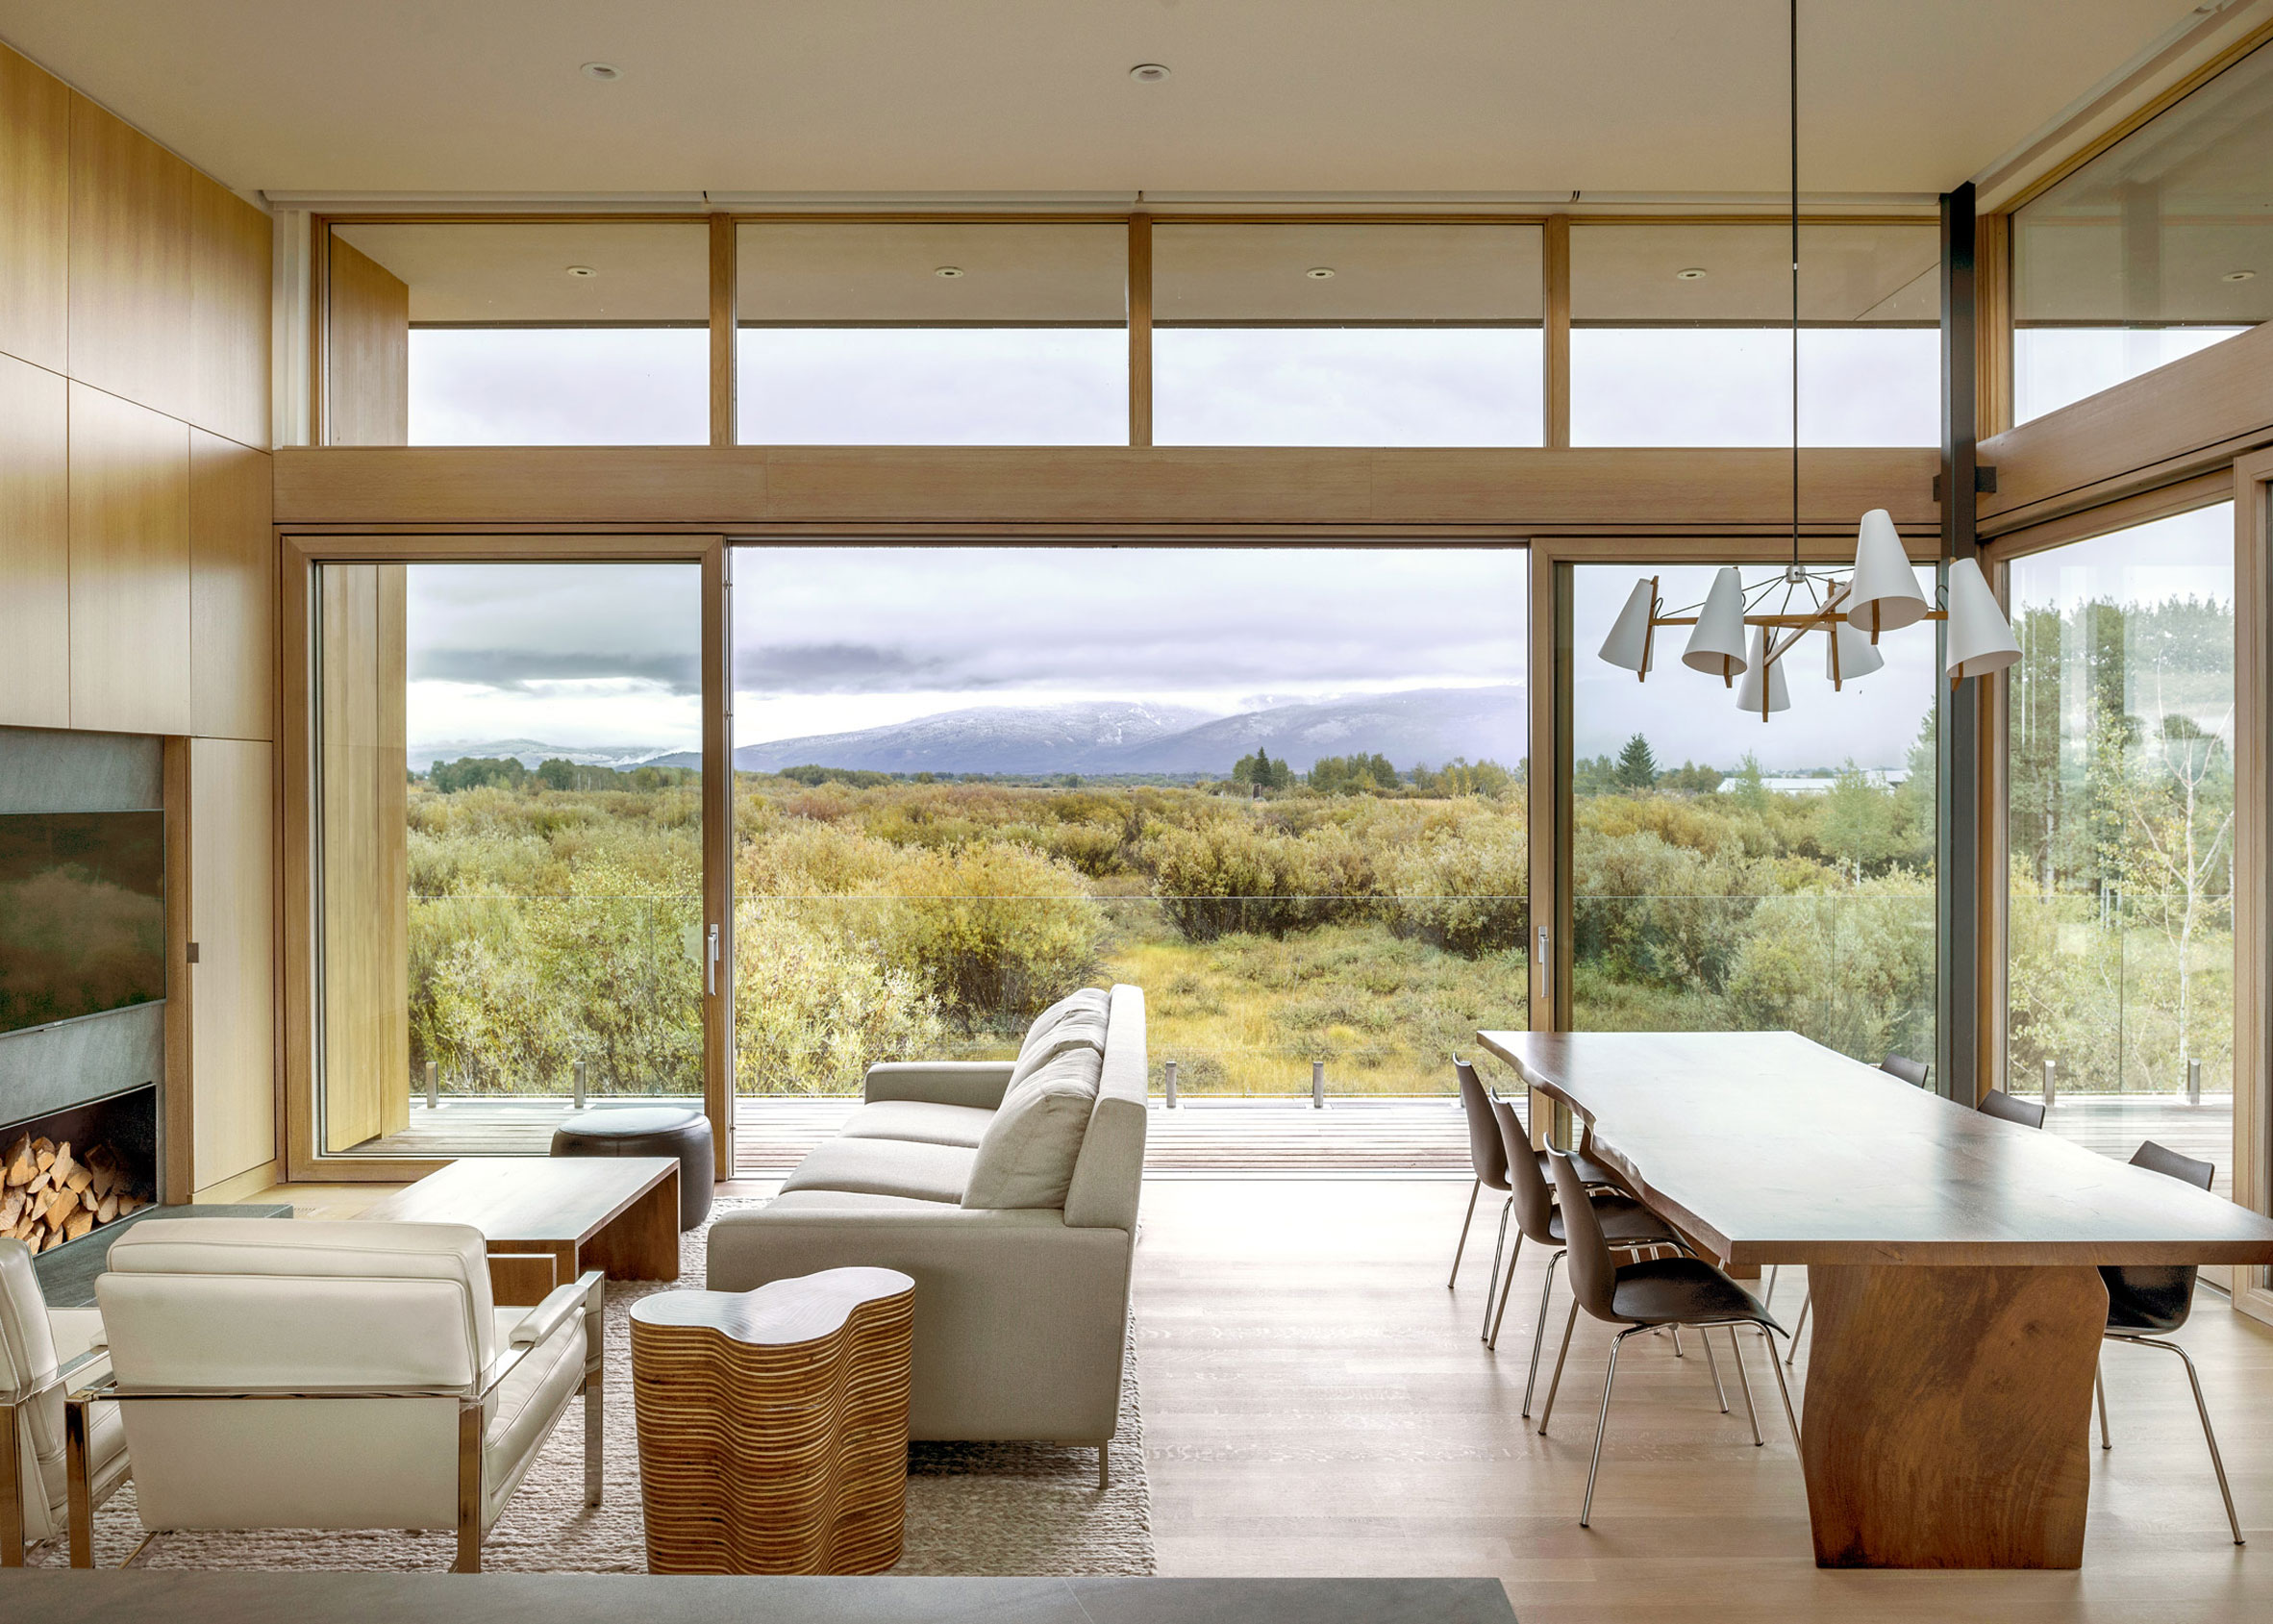 Teton Valley Residence, Idaho, by Ro Rockett Design